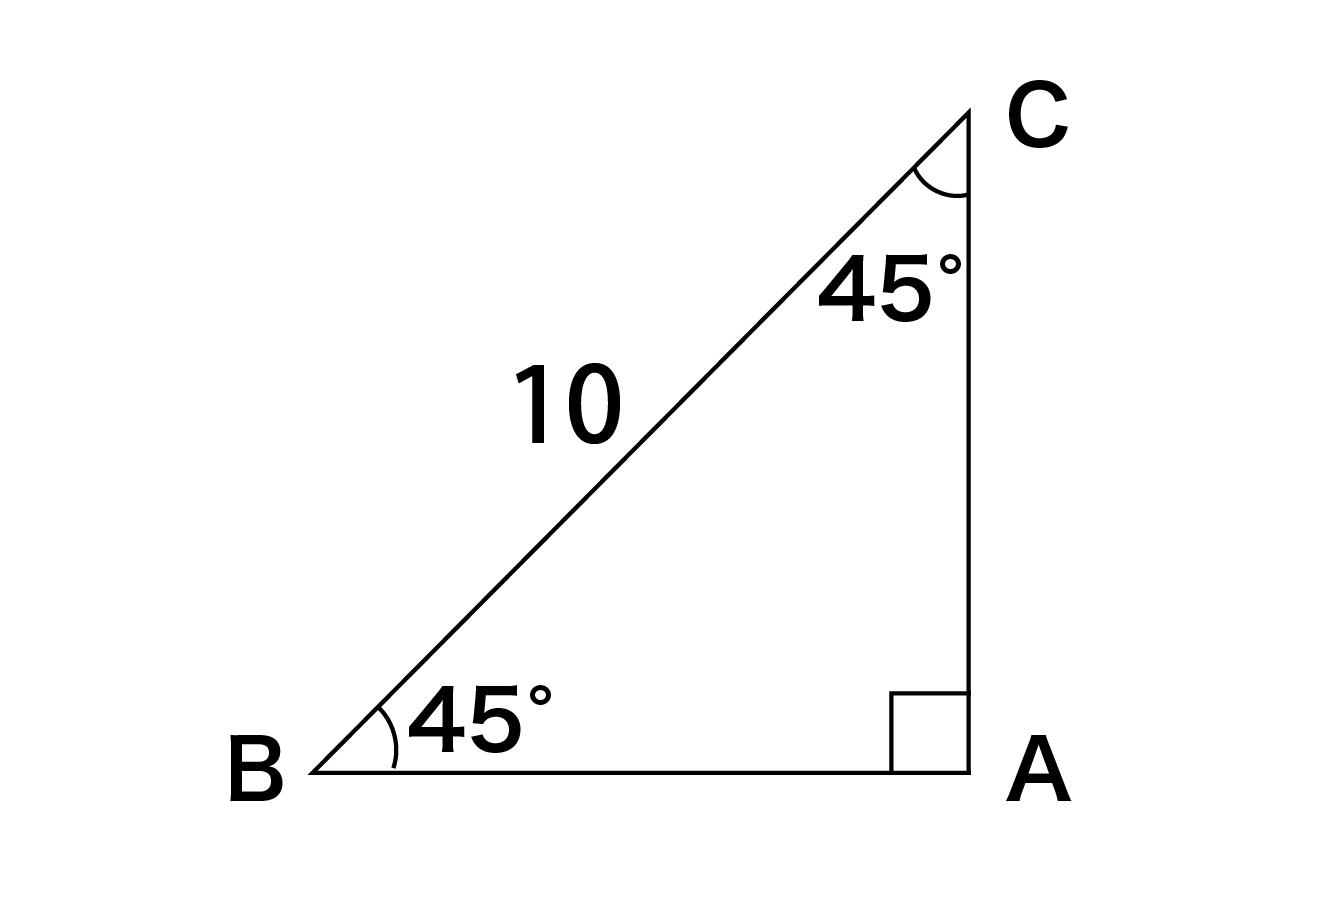 BC=10の直角二等辺三角形